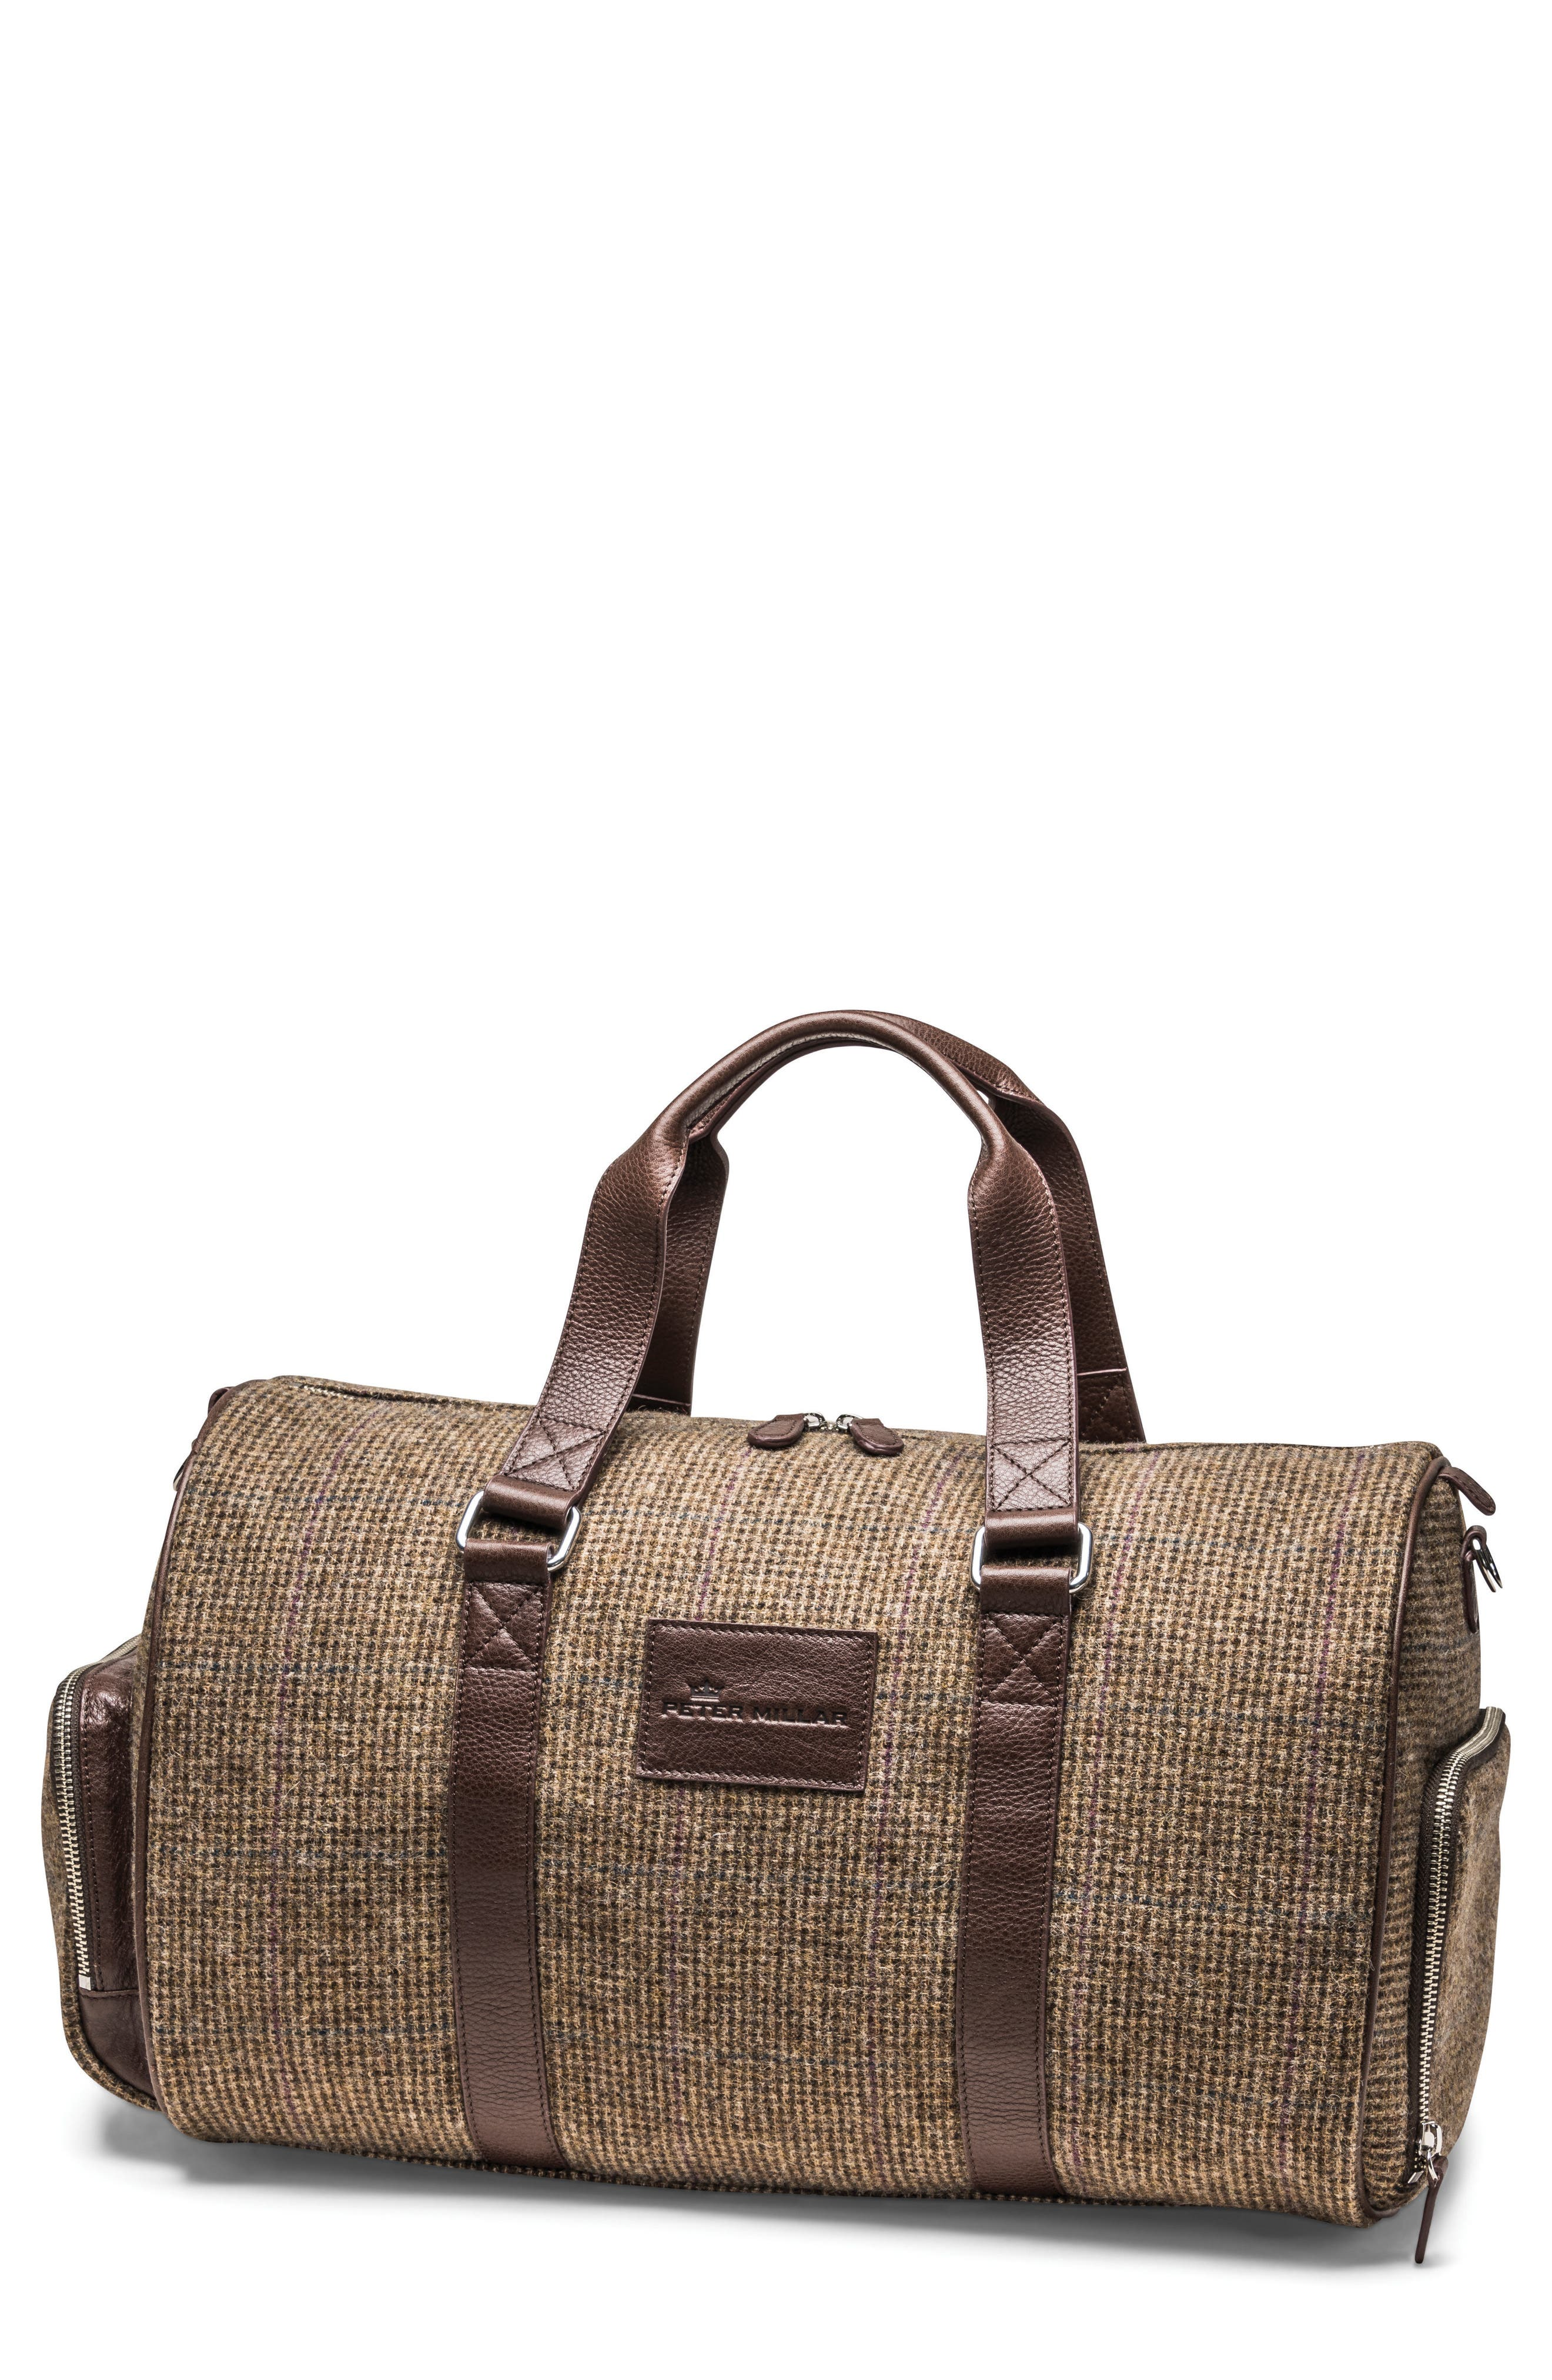 Mountainside Day Duffel Bag,                         Main,                         color, Tweed